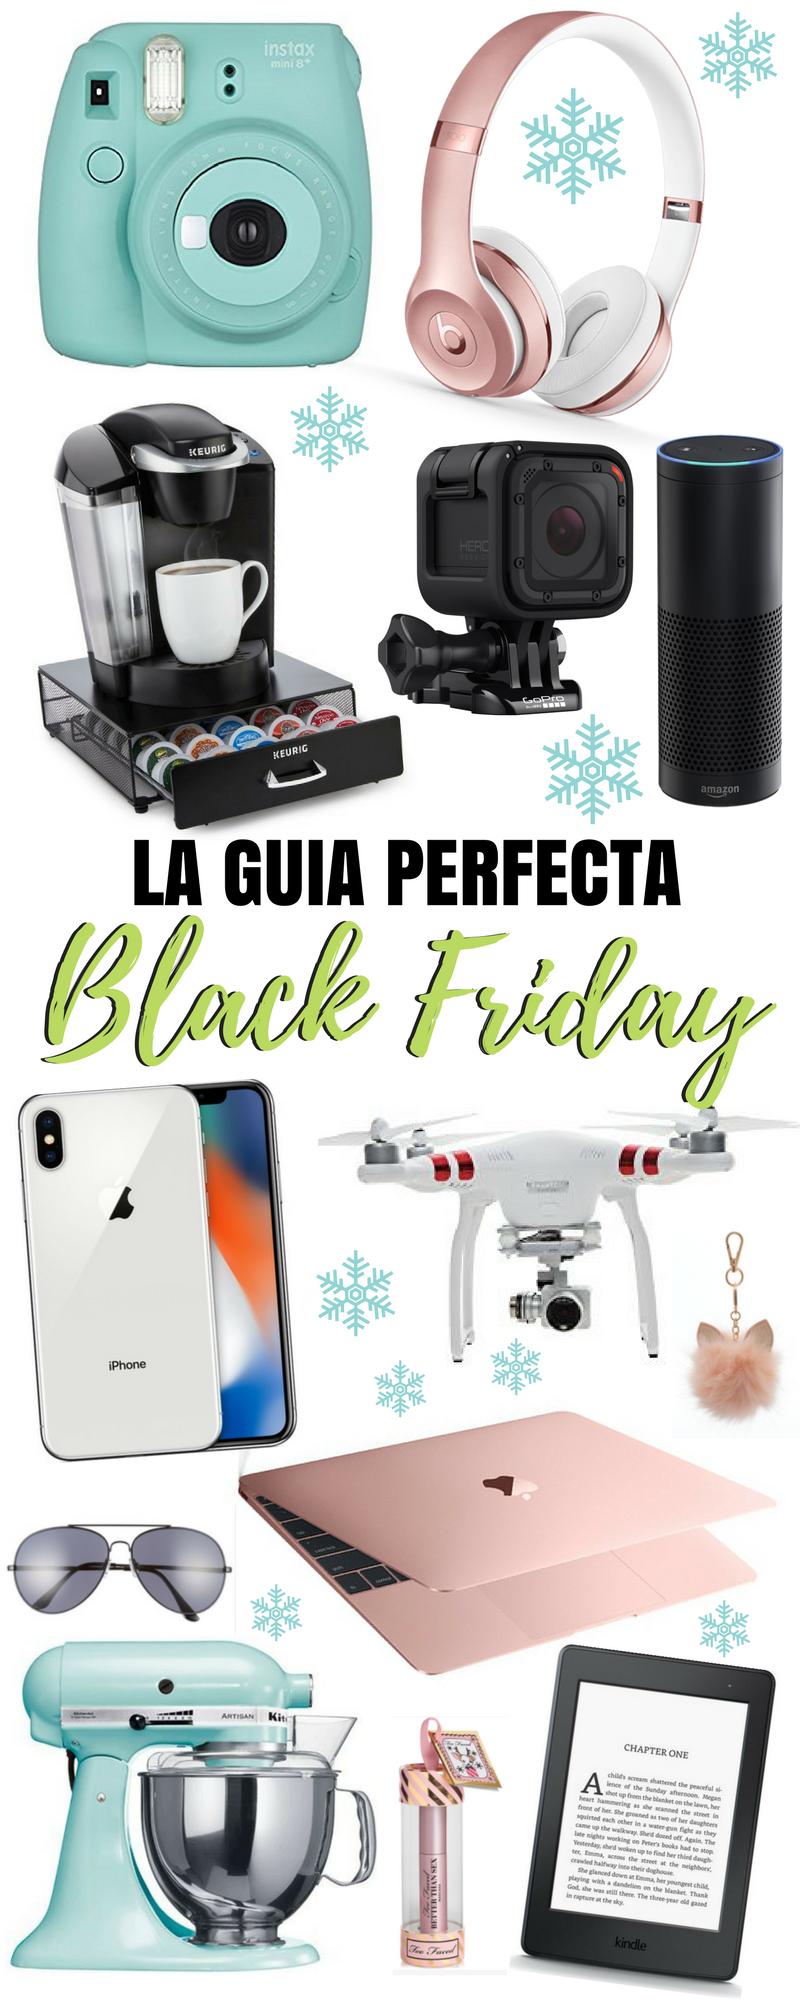 Black Friday GUIDE by tufashionopetite alejandra avila